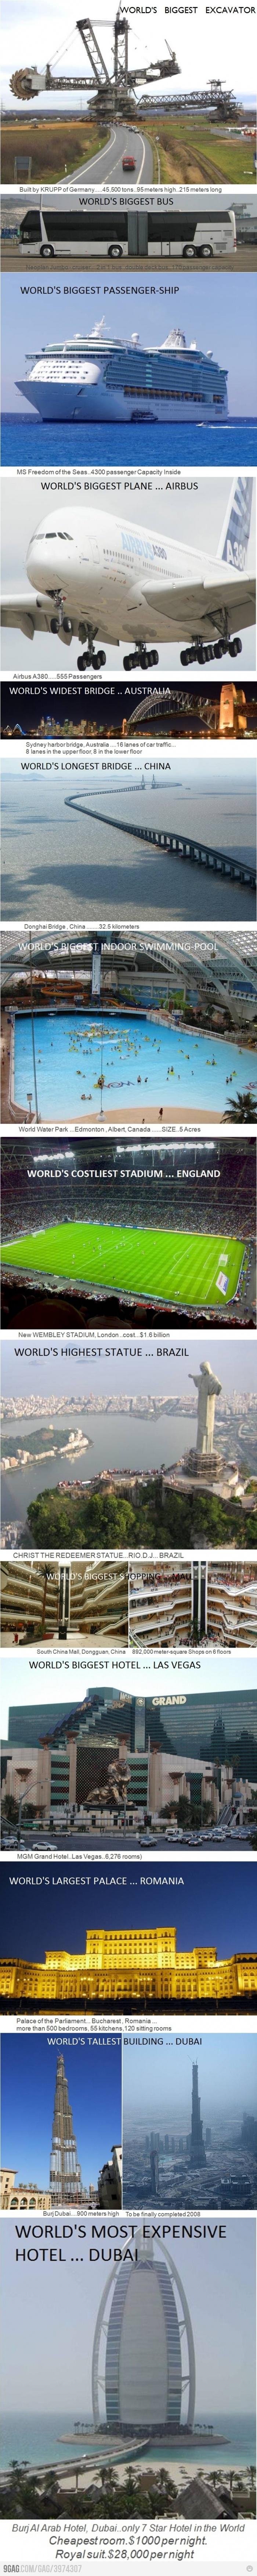 Epic world records